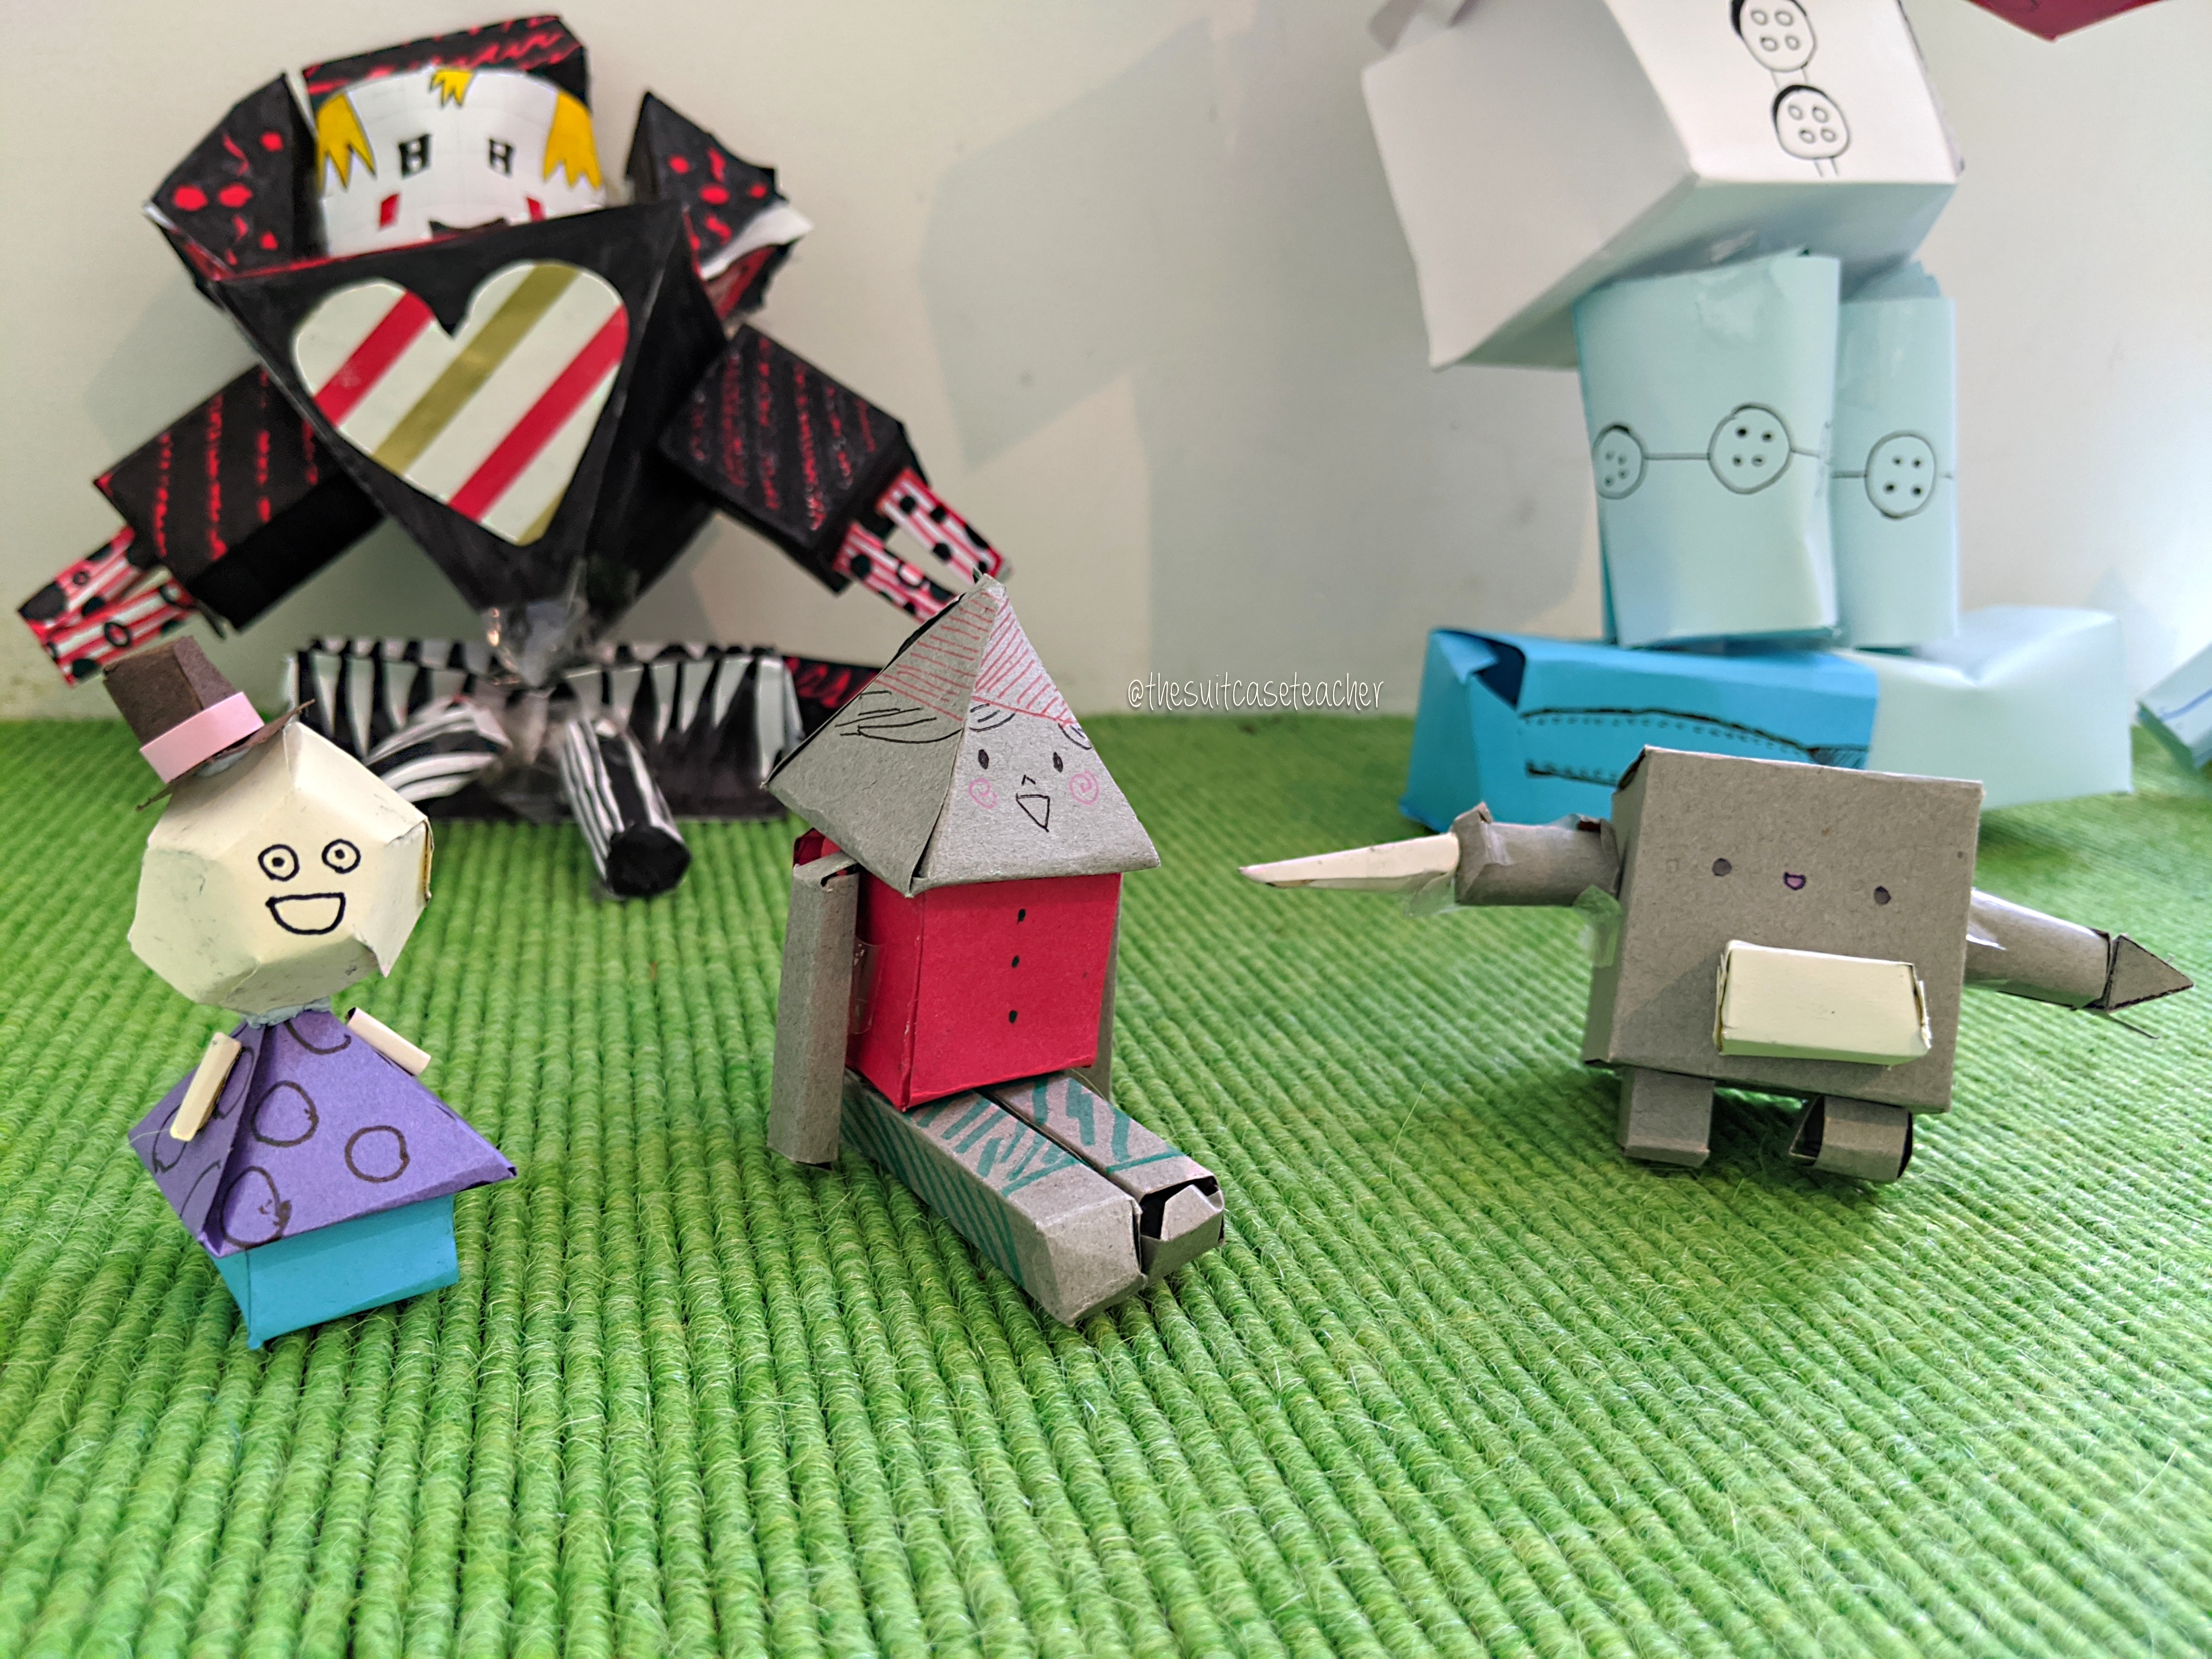 designandbuilda3Drobot_thesuitcaseteacher.jpg